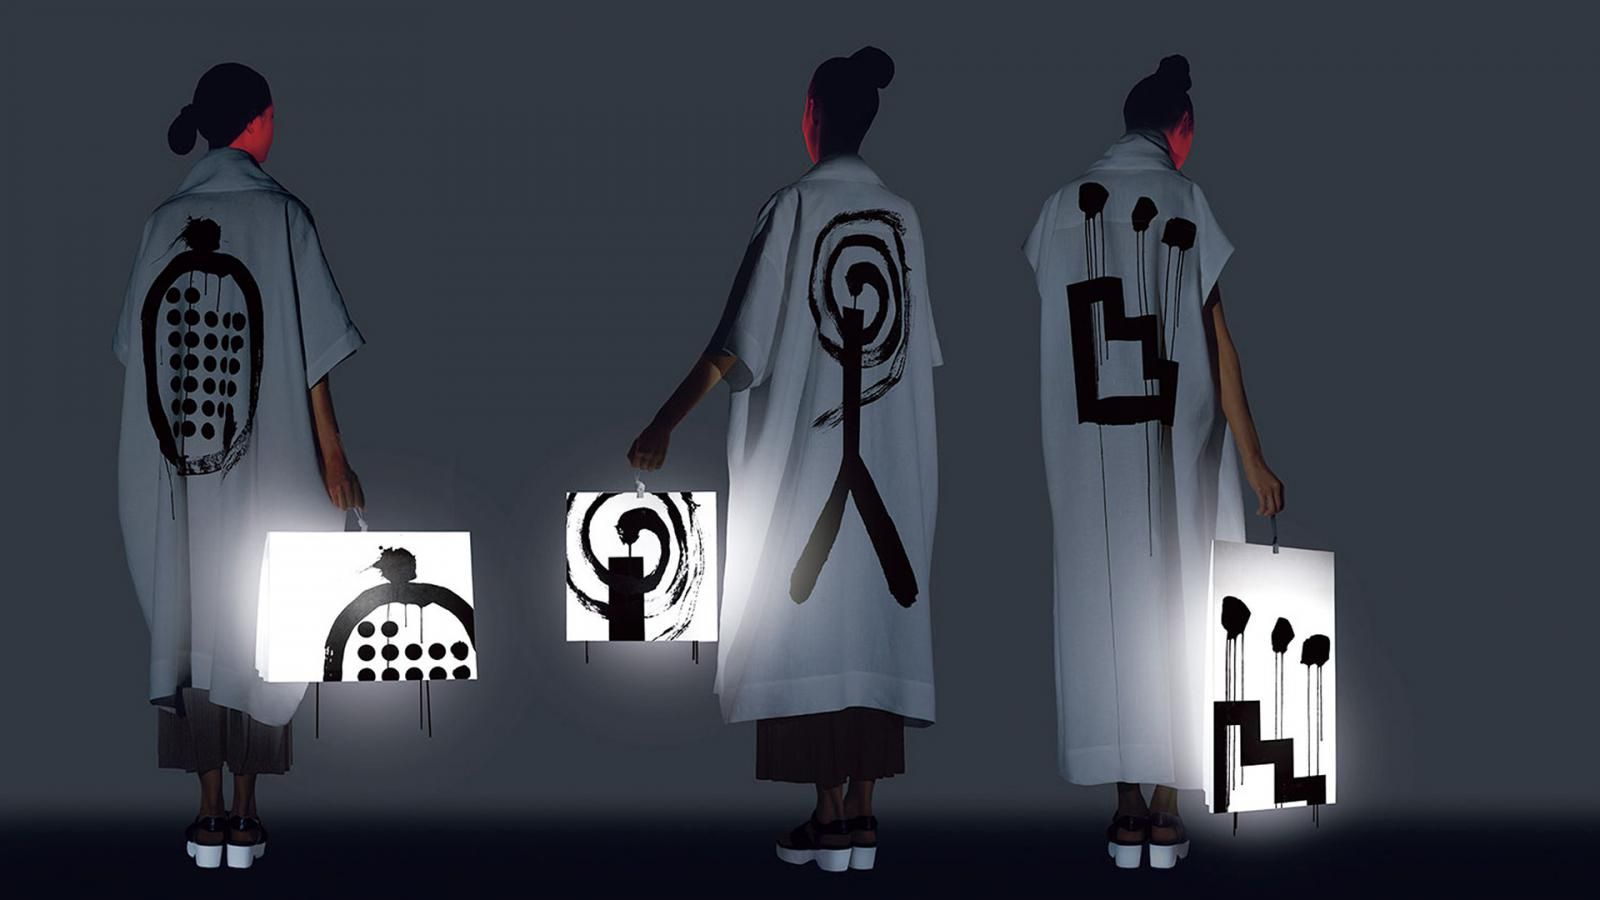 Issey Miyake: волшебная графика Икко Танаки